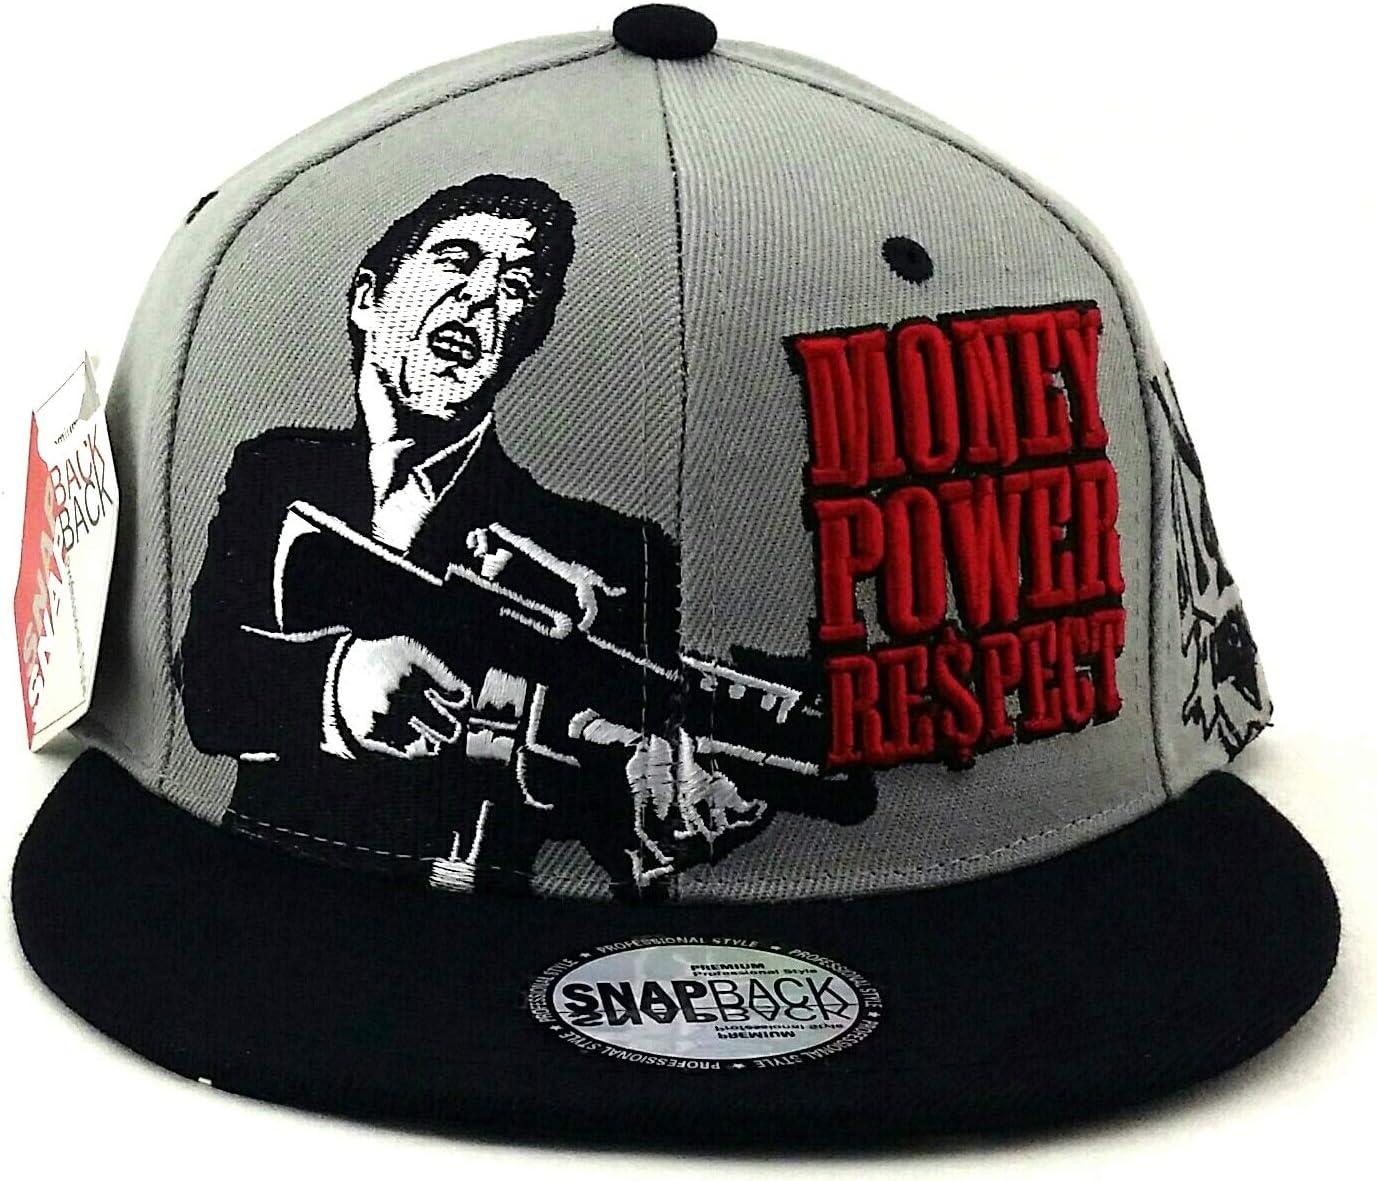 Scarface New Top Pro Money Power Respect Black White Red Era Snapback Hat Cap